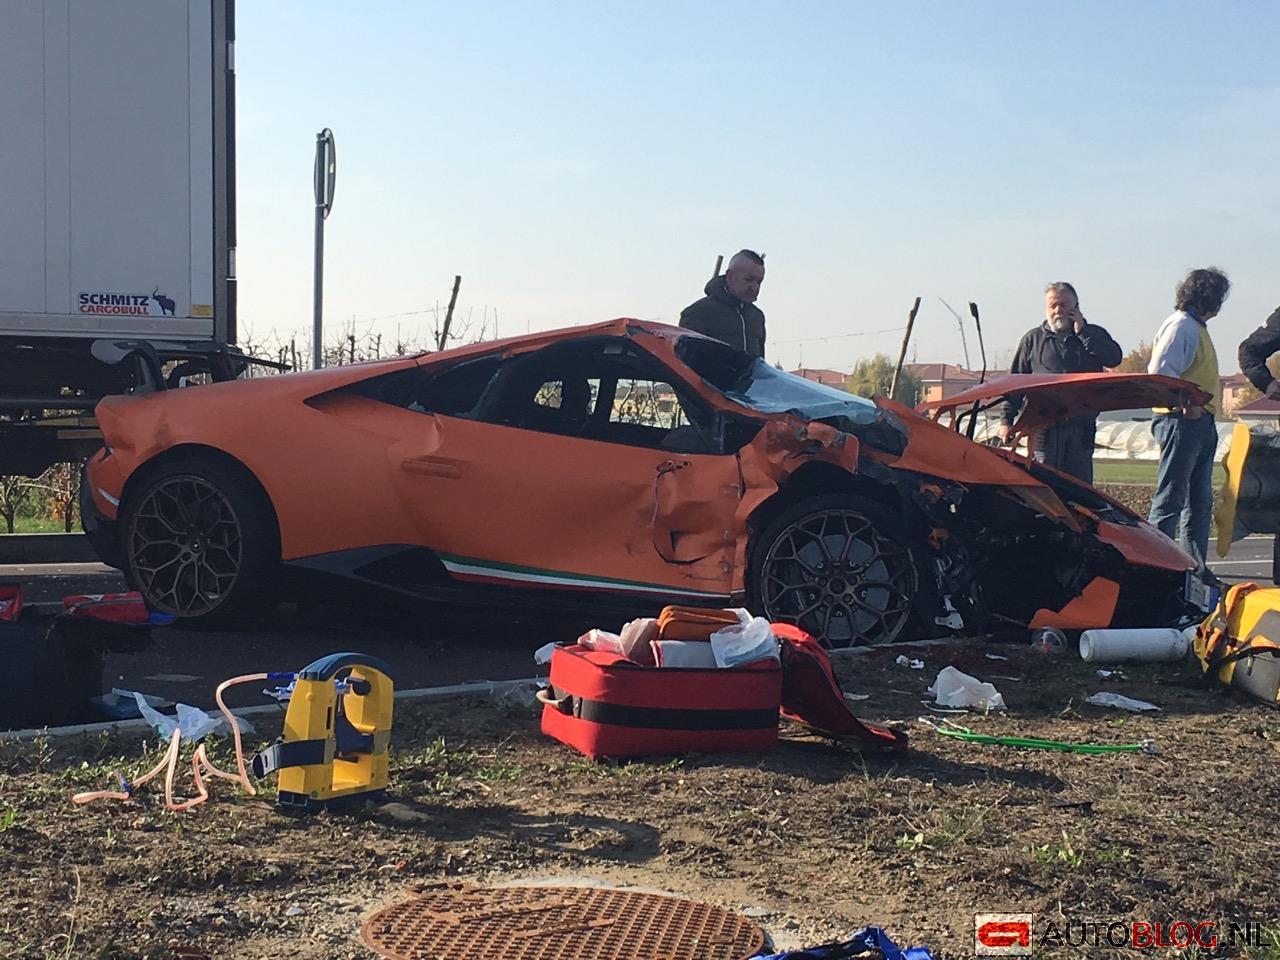 Lamborghini-Huracan-Performante-crash-01.jpg